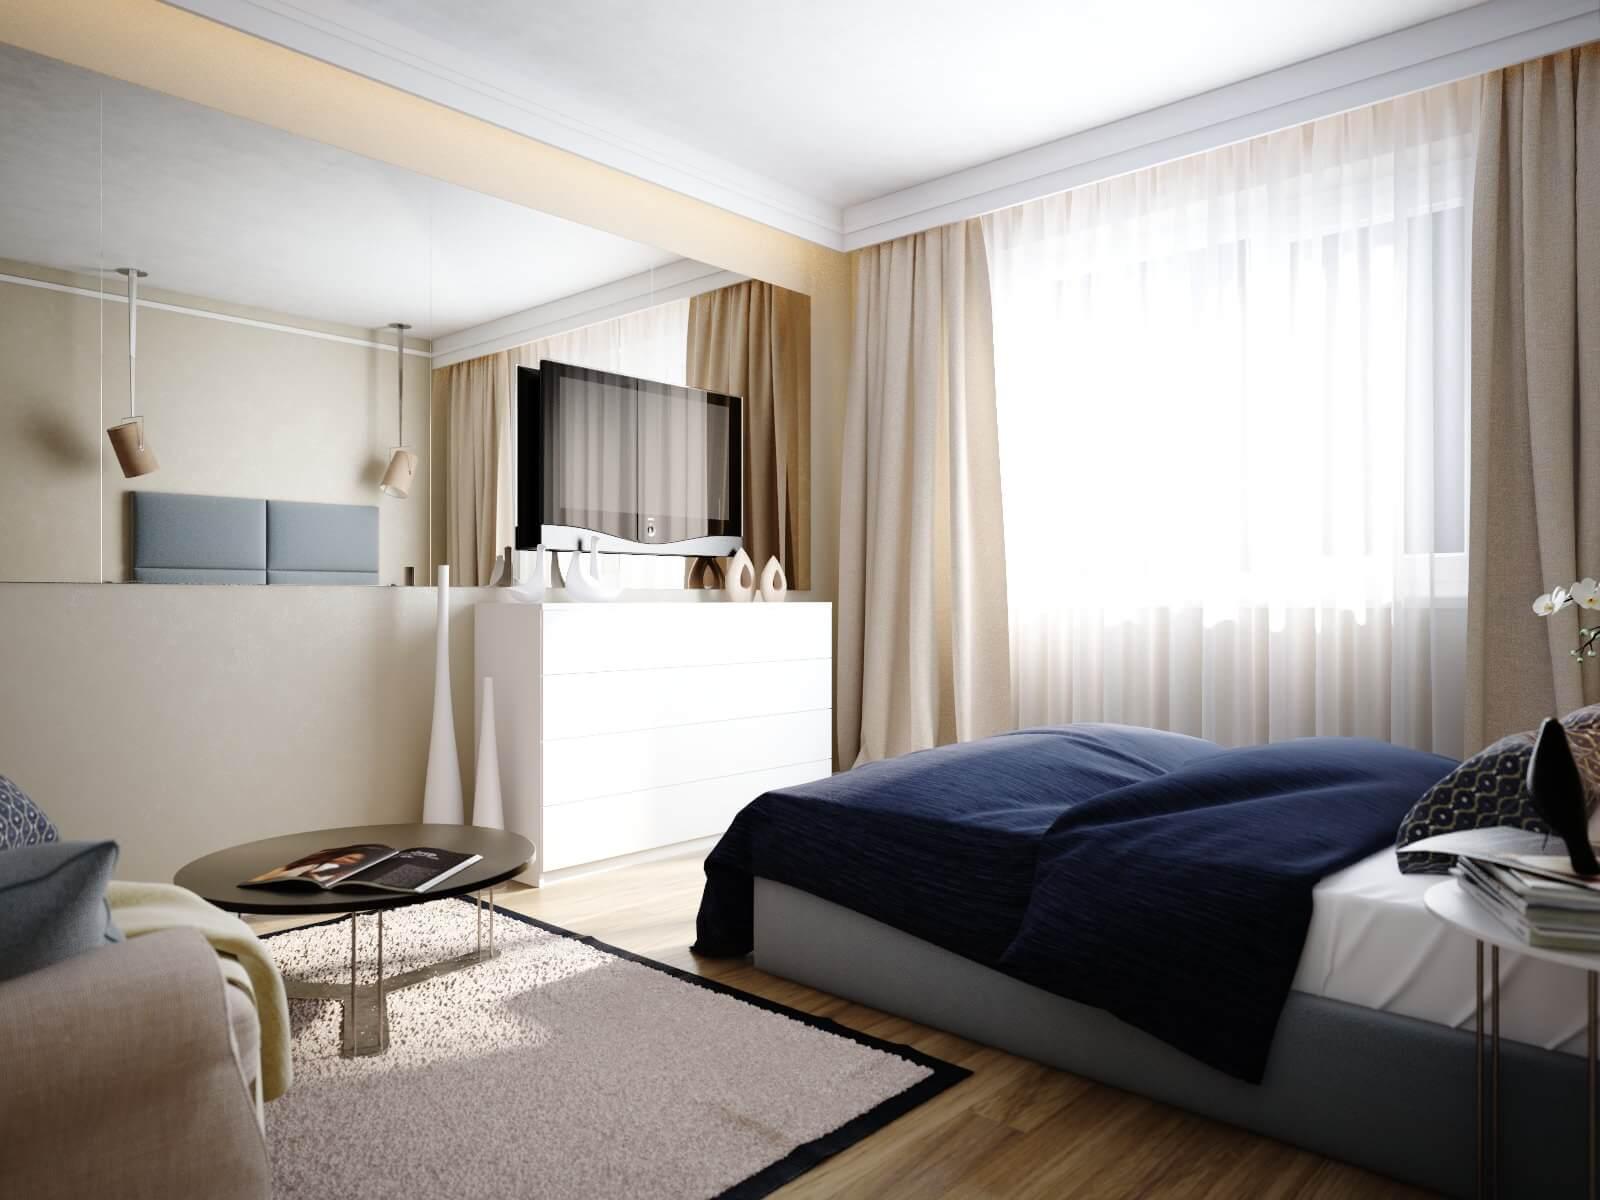 дизайн квартир примеры работ